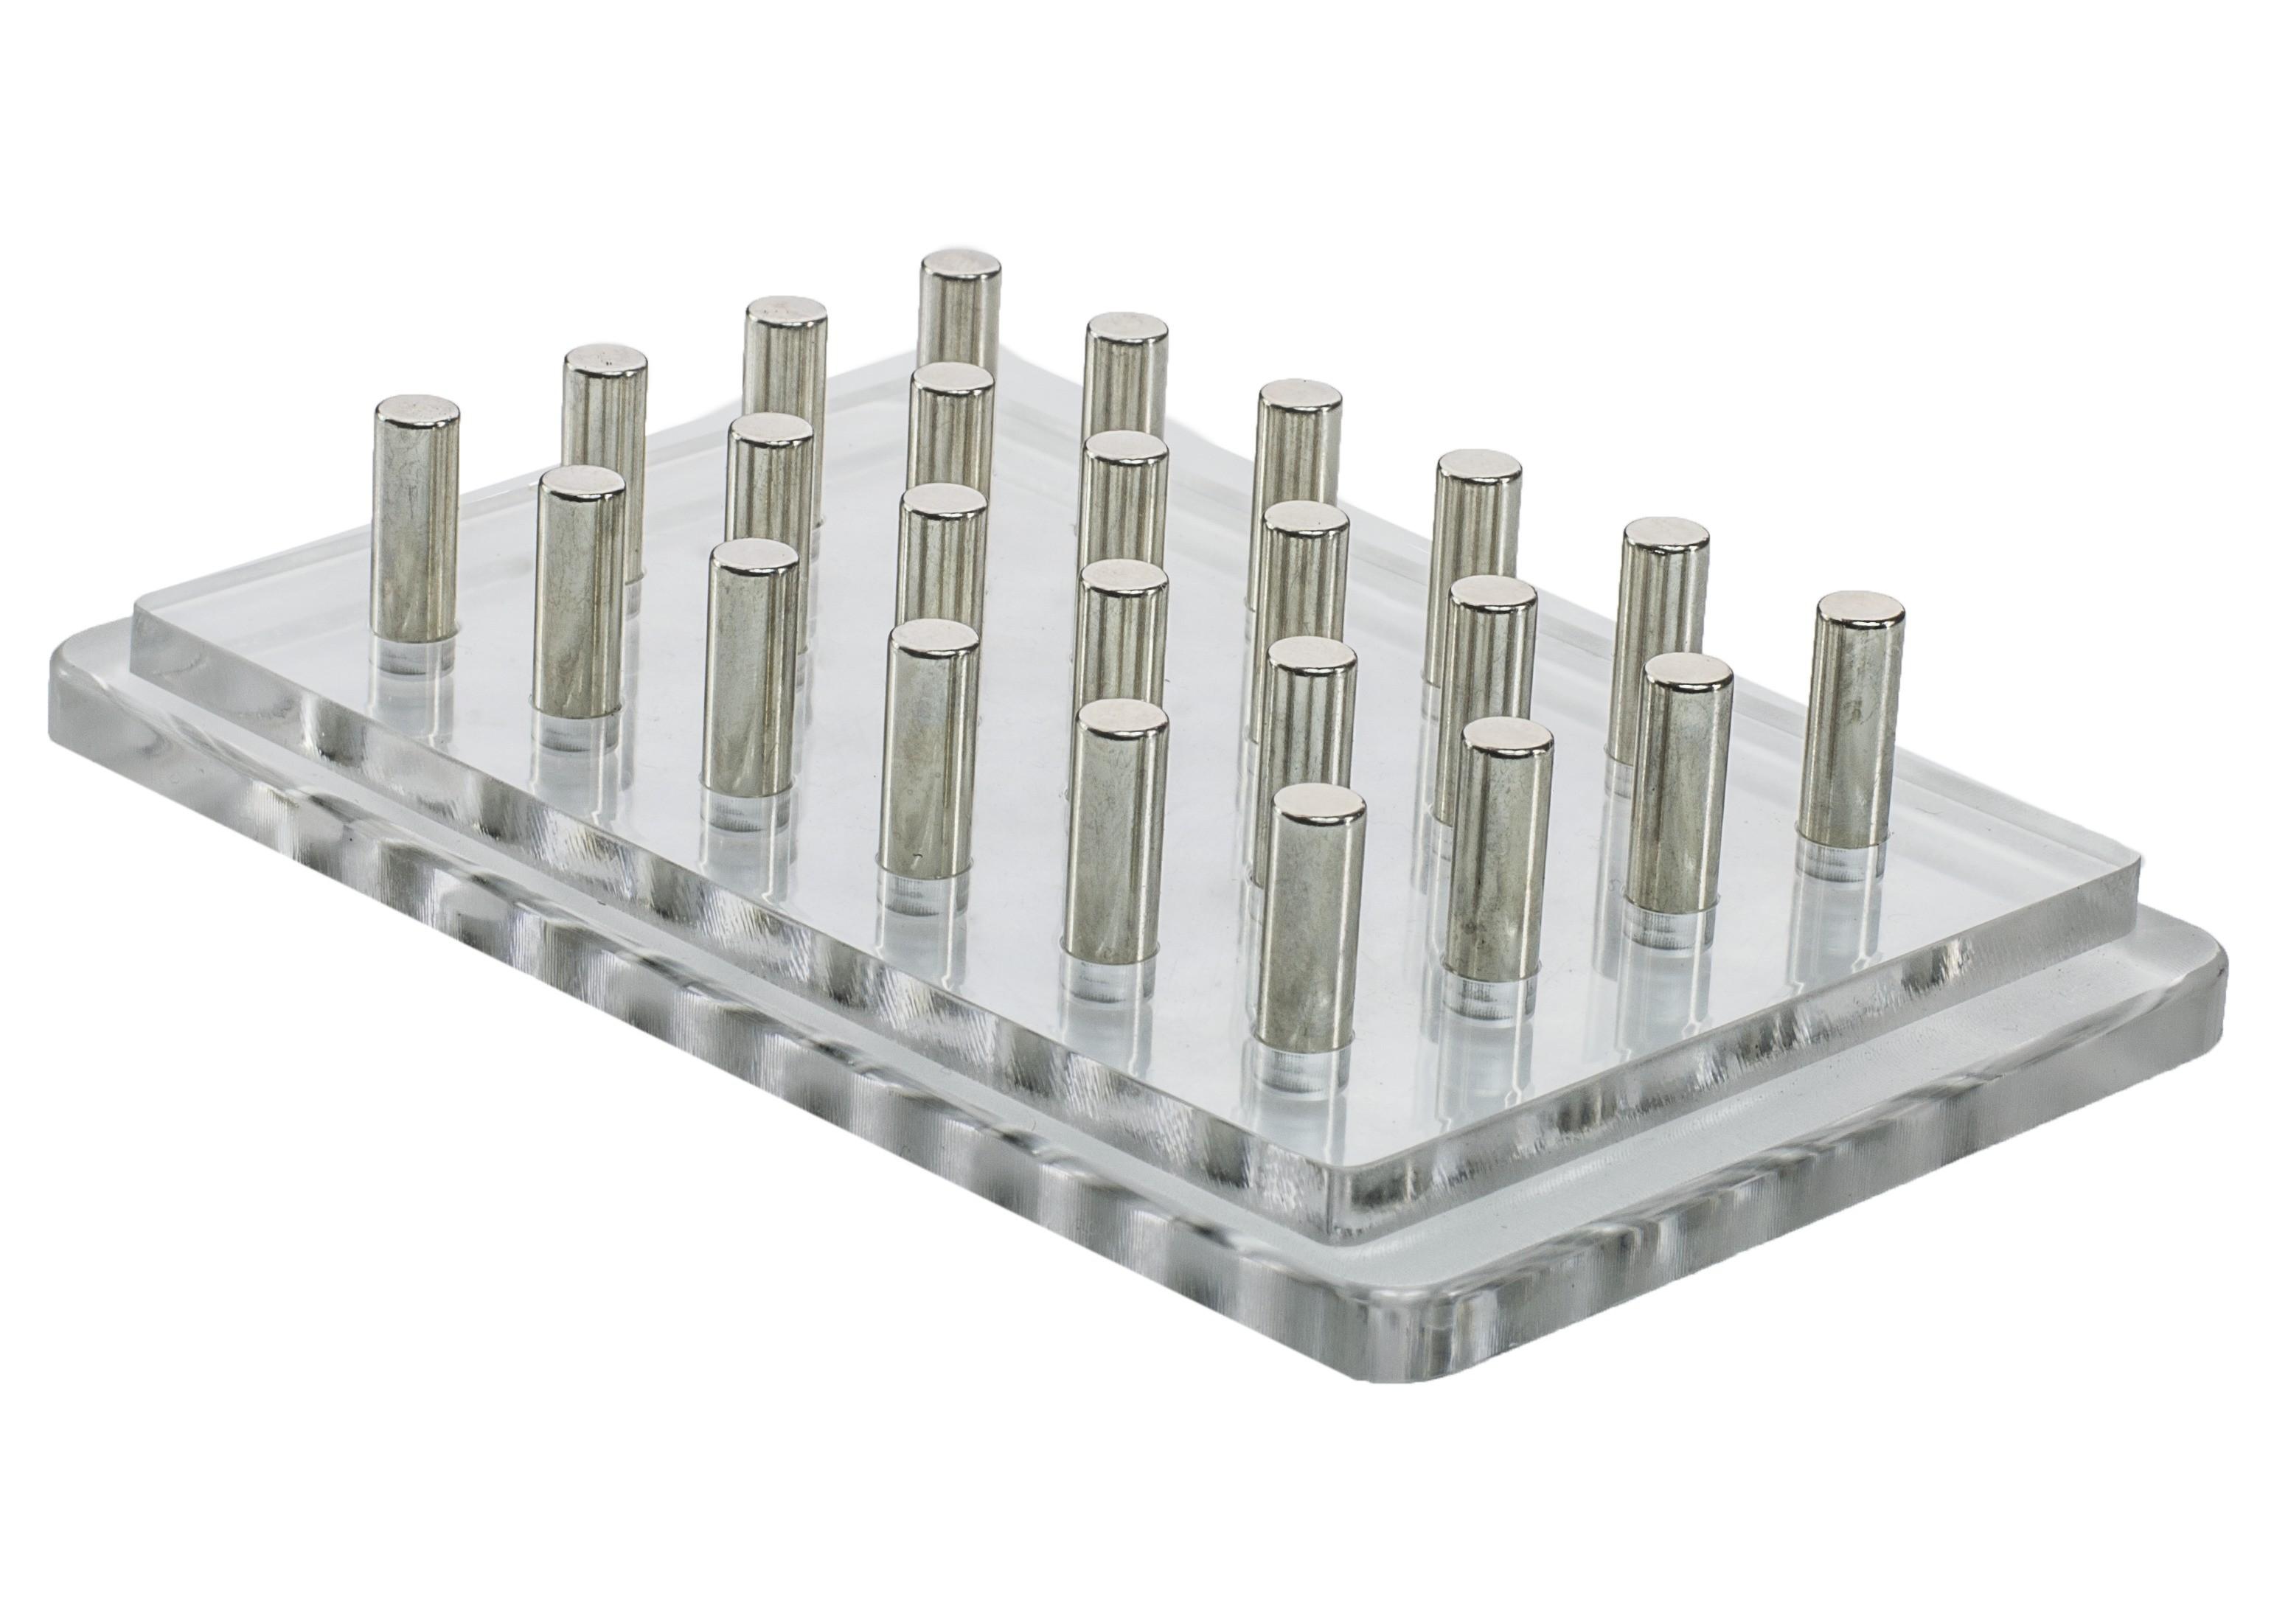 SP Bel-Art Magnetic Bead Separation Rack for 96-Well PCR Tube Plate